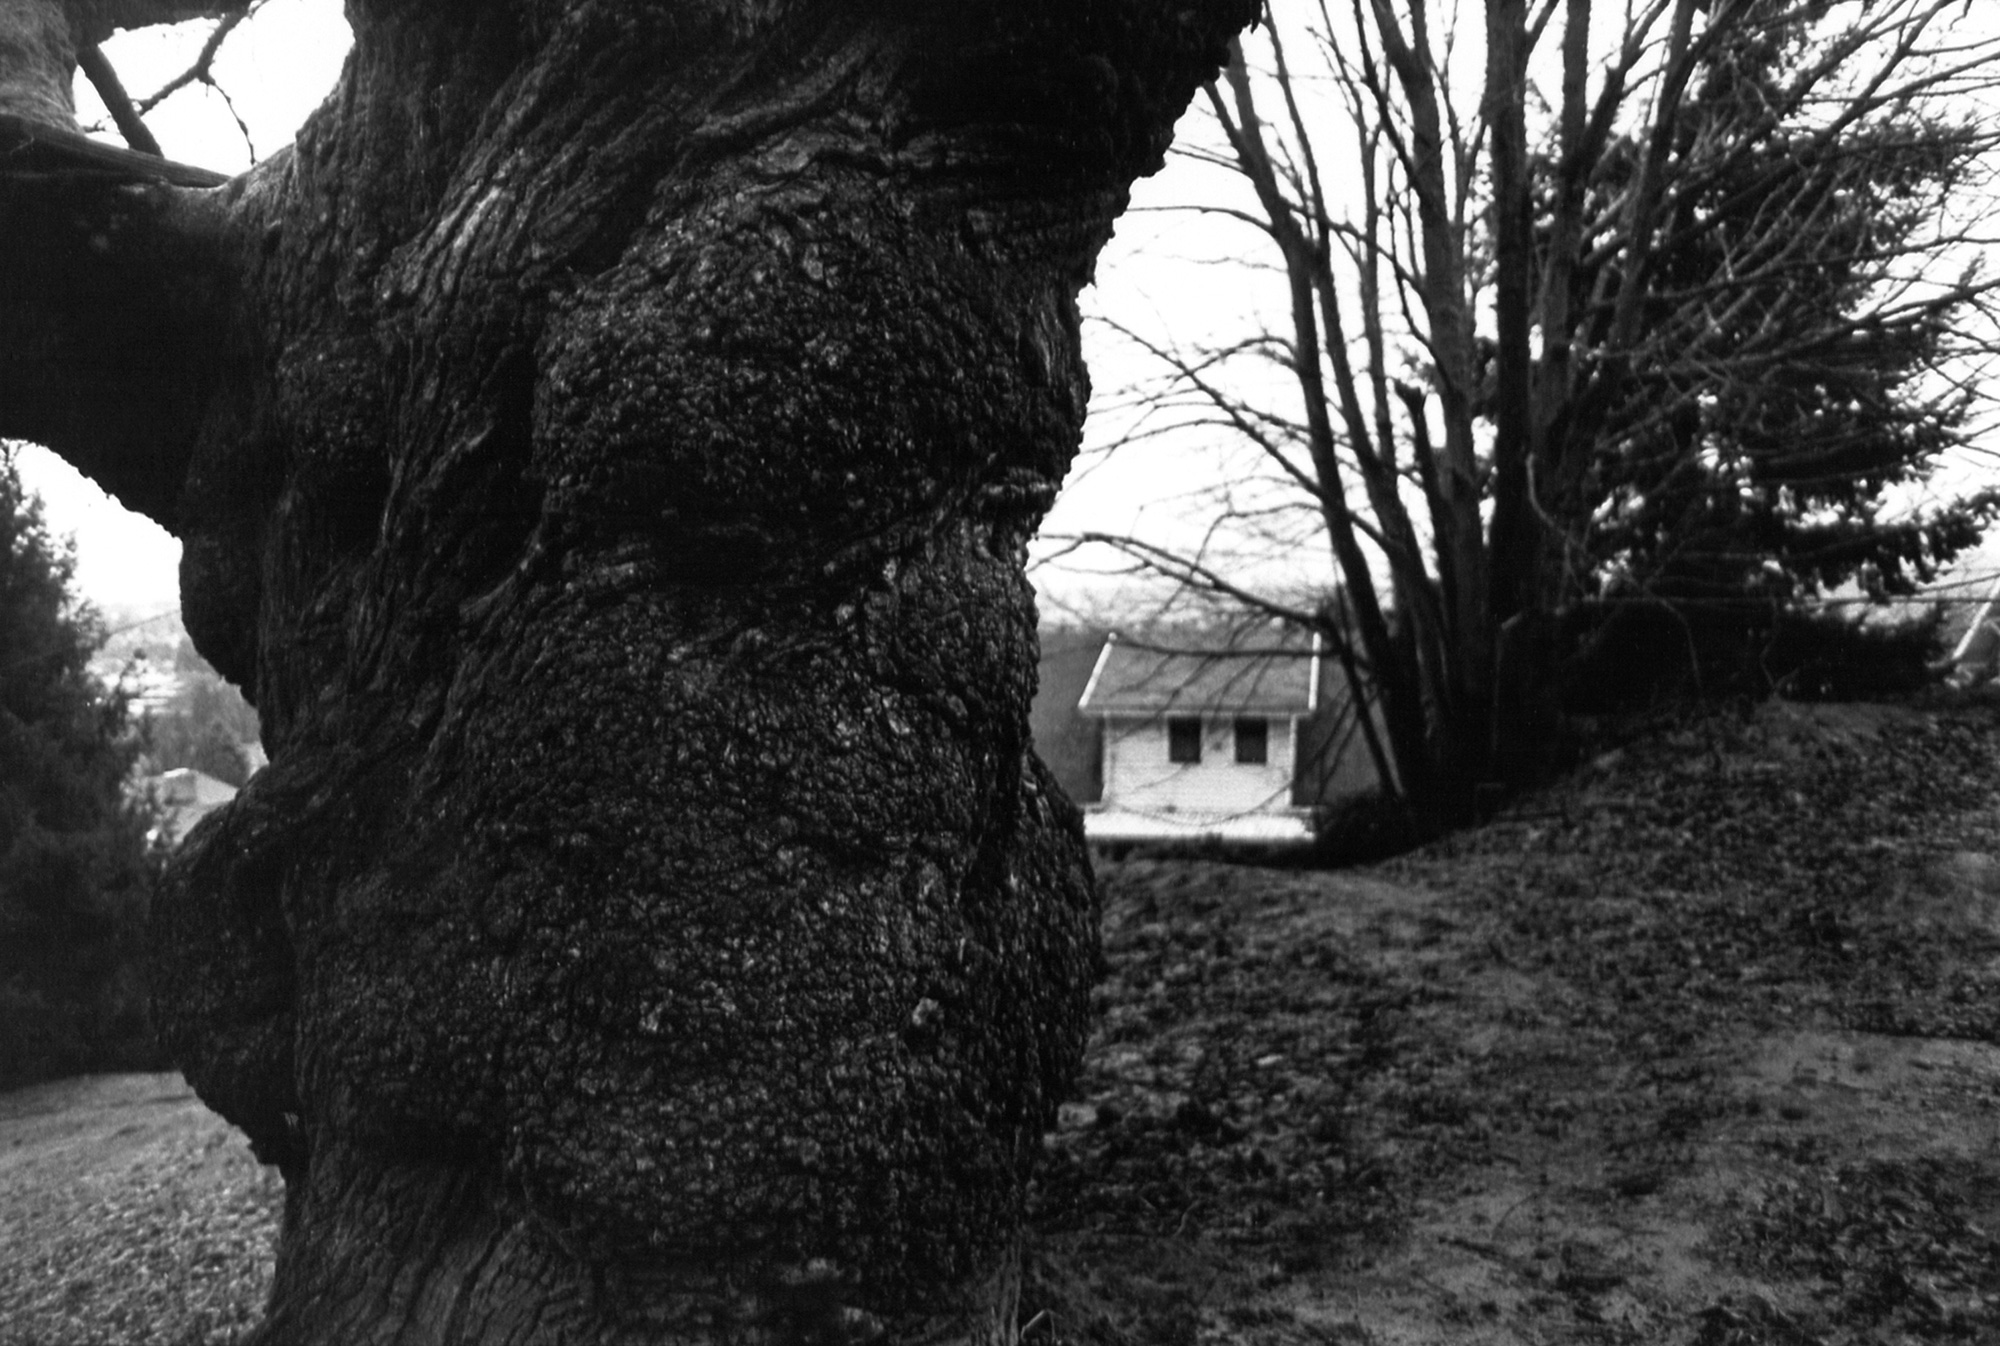 11_kendellen_1999_mttabor_tree.jpg